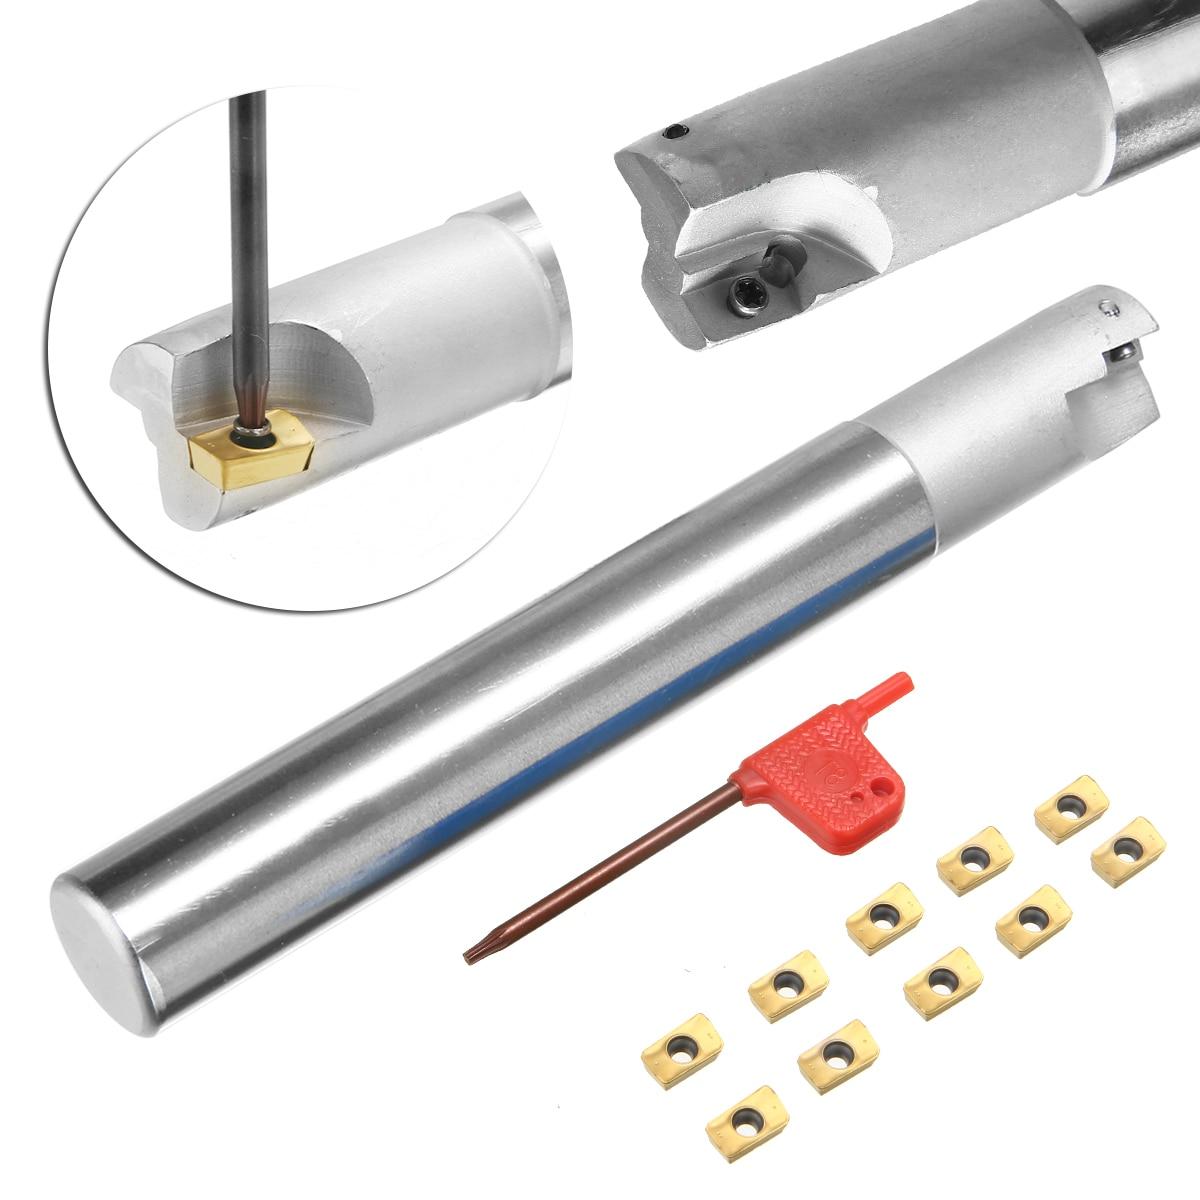 1P 300R-20-150L-C20-2T Indexable End milling Holder+10PCS APMT1135PDER-FM insert